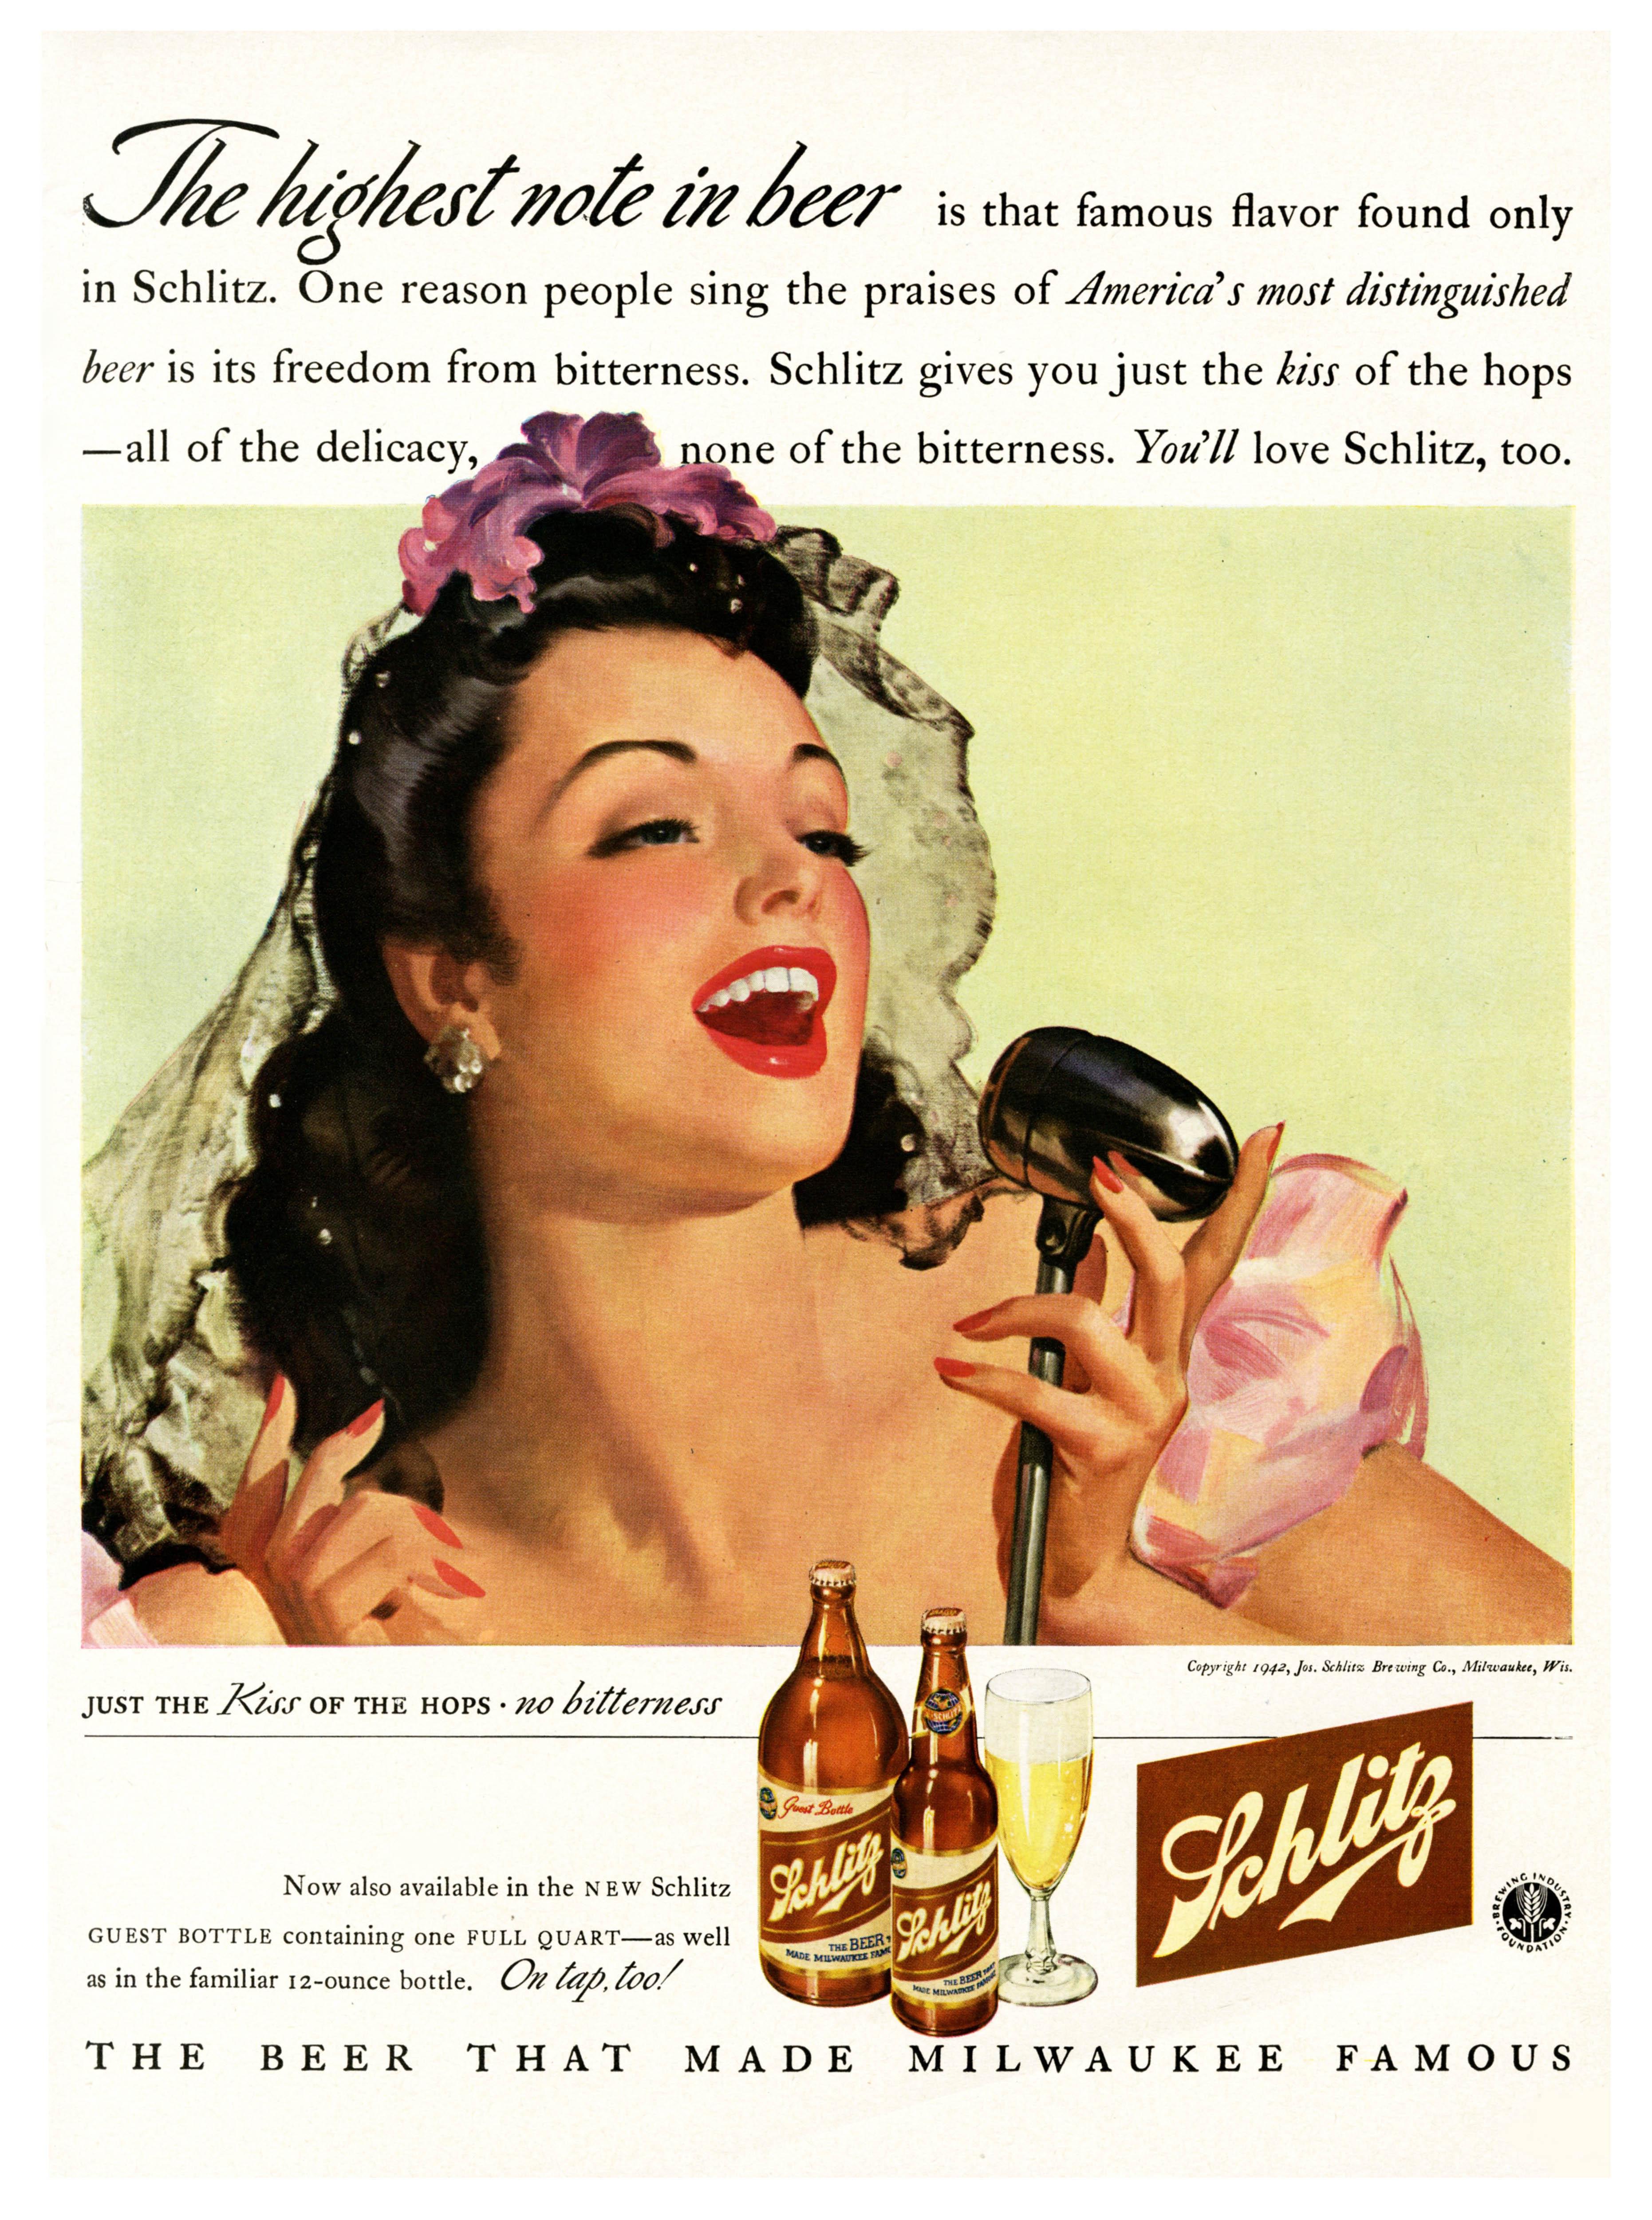 Joseph Schlitz Brewing Company - 1942